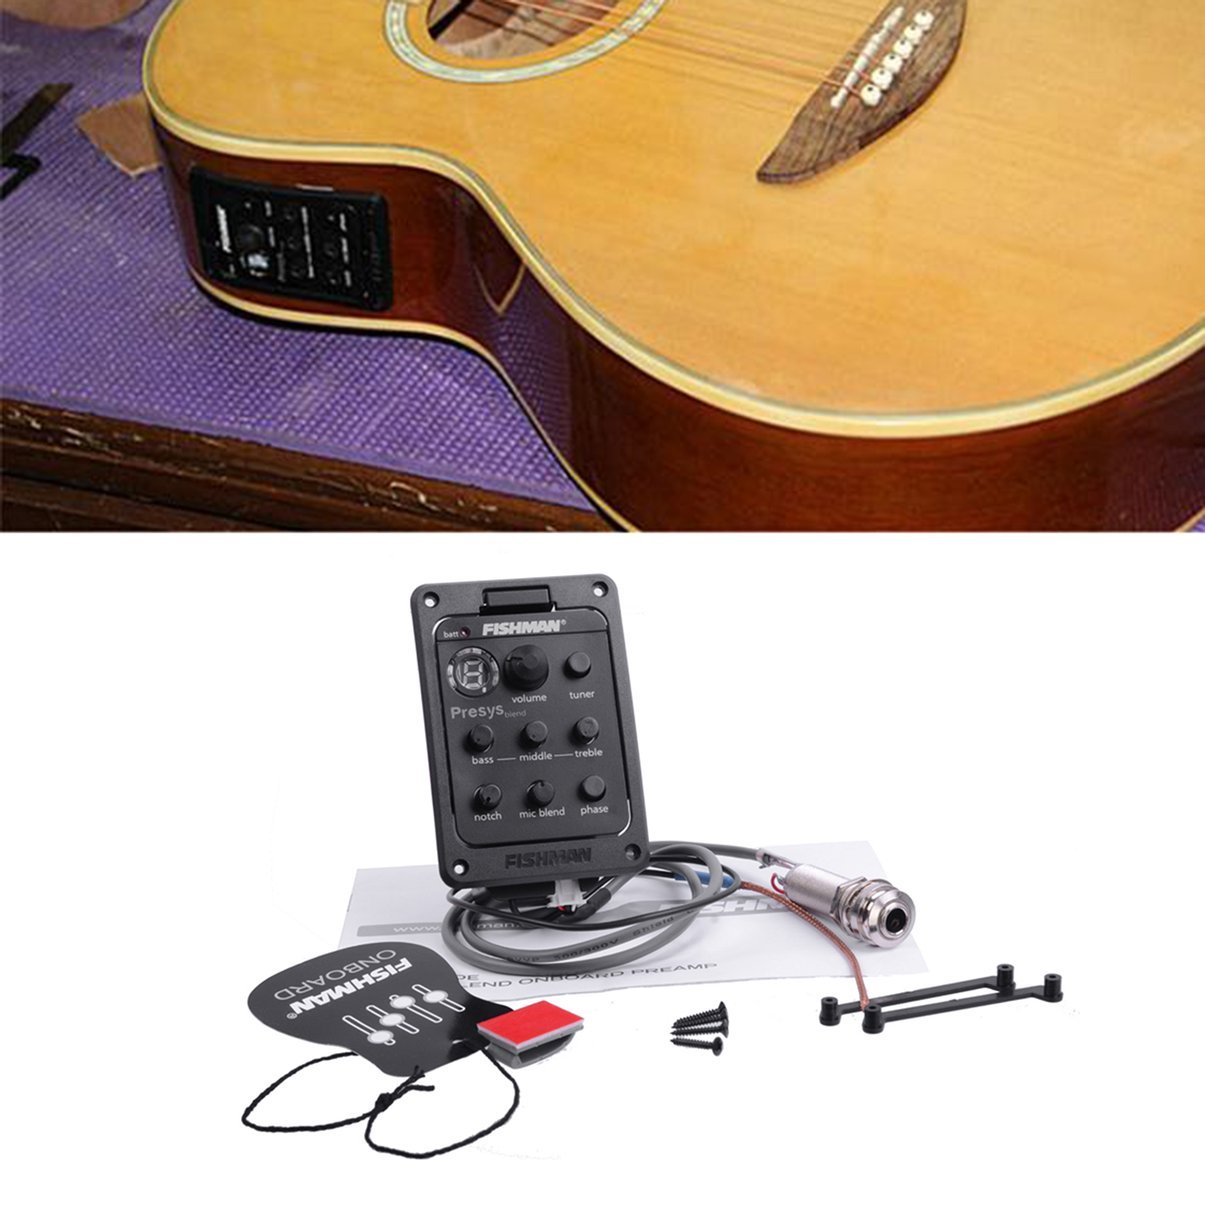 Fishman - Ecualizador de guitarra acústica de 4 bandas con certificación CE: Amazon.es: Instrumentos musicales